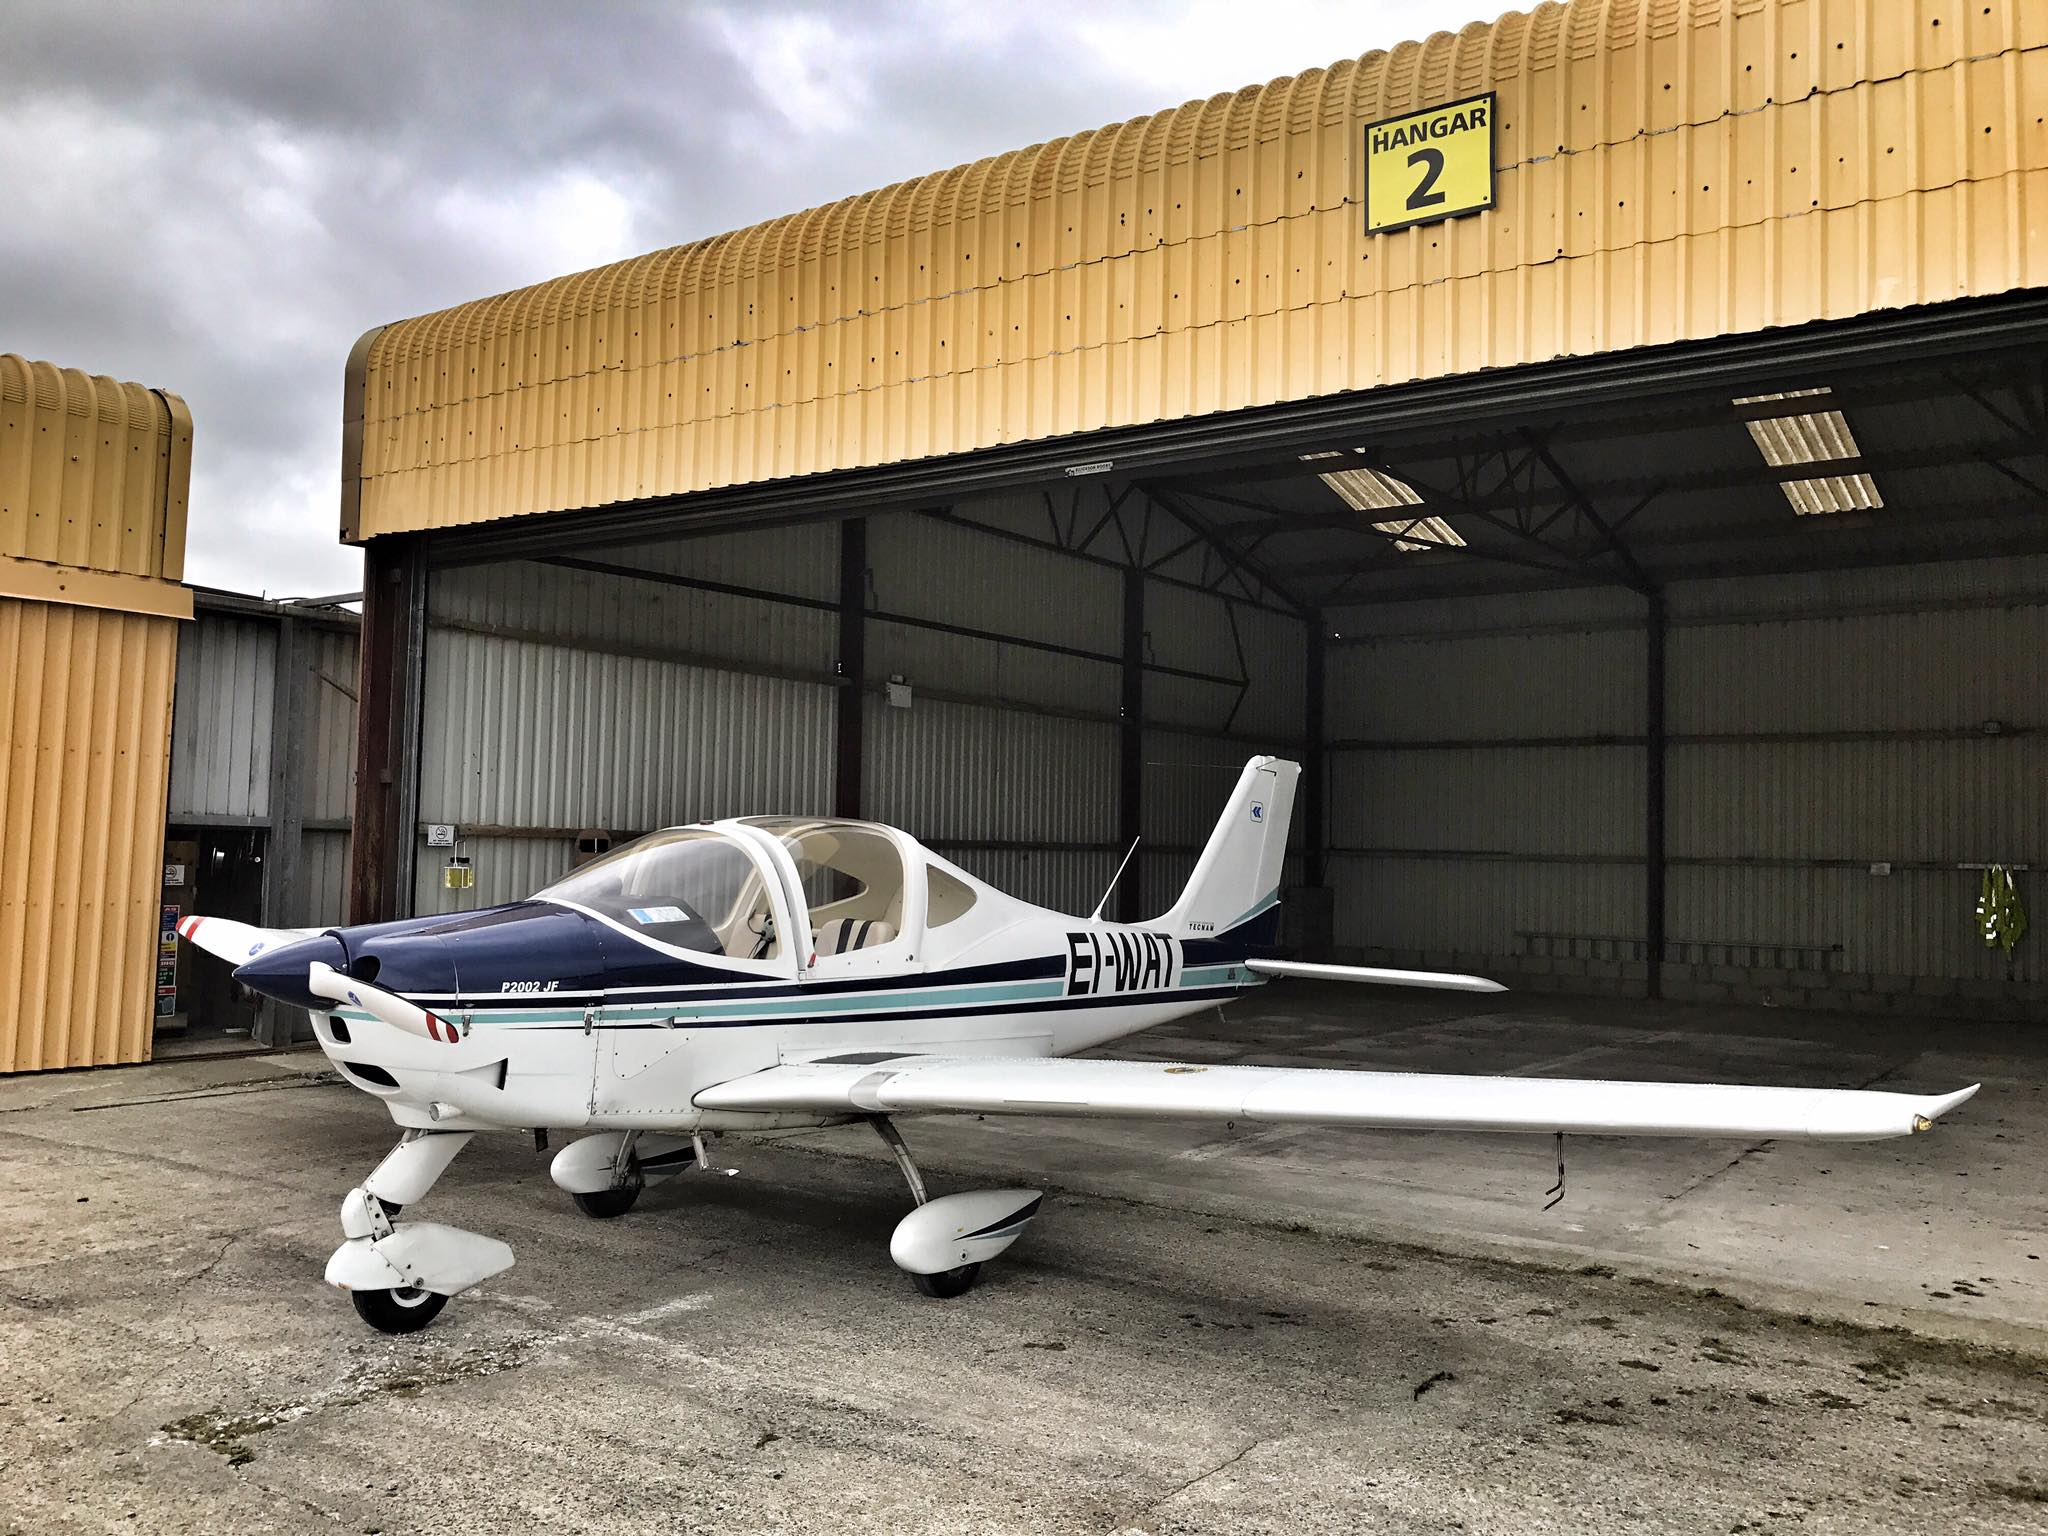 P2002JF EI-WAT in the Waterford Aero Club hangar